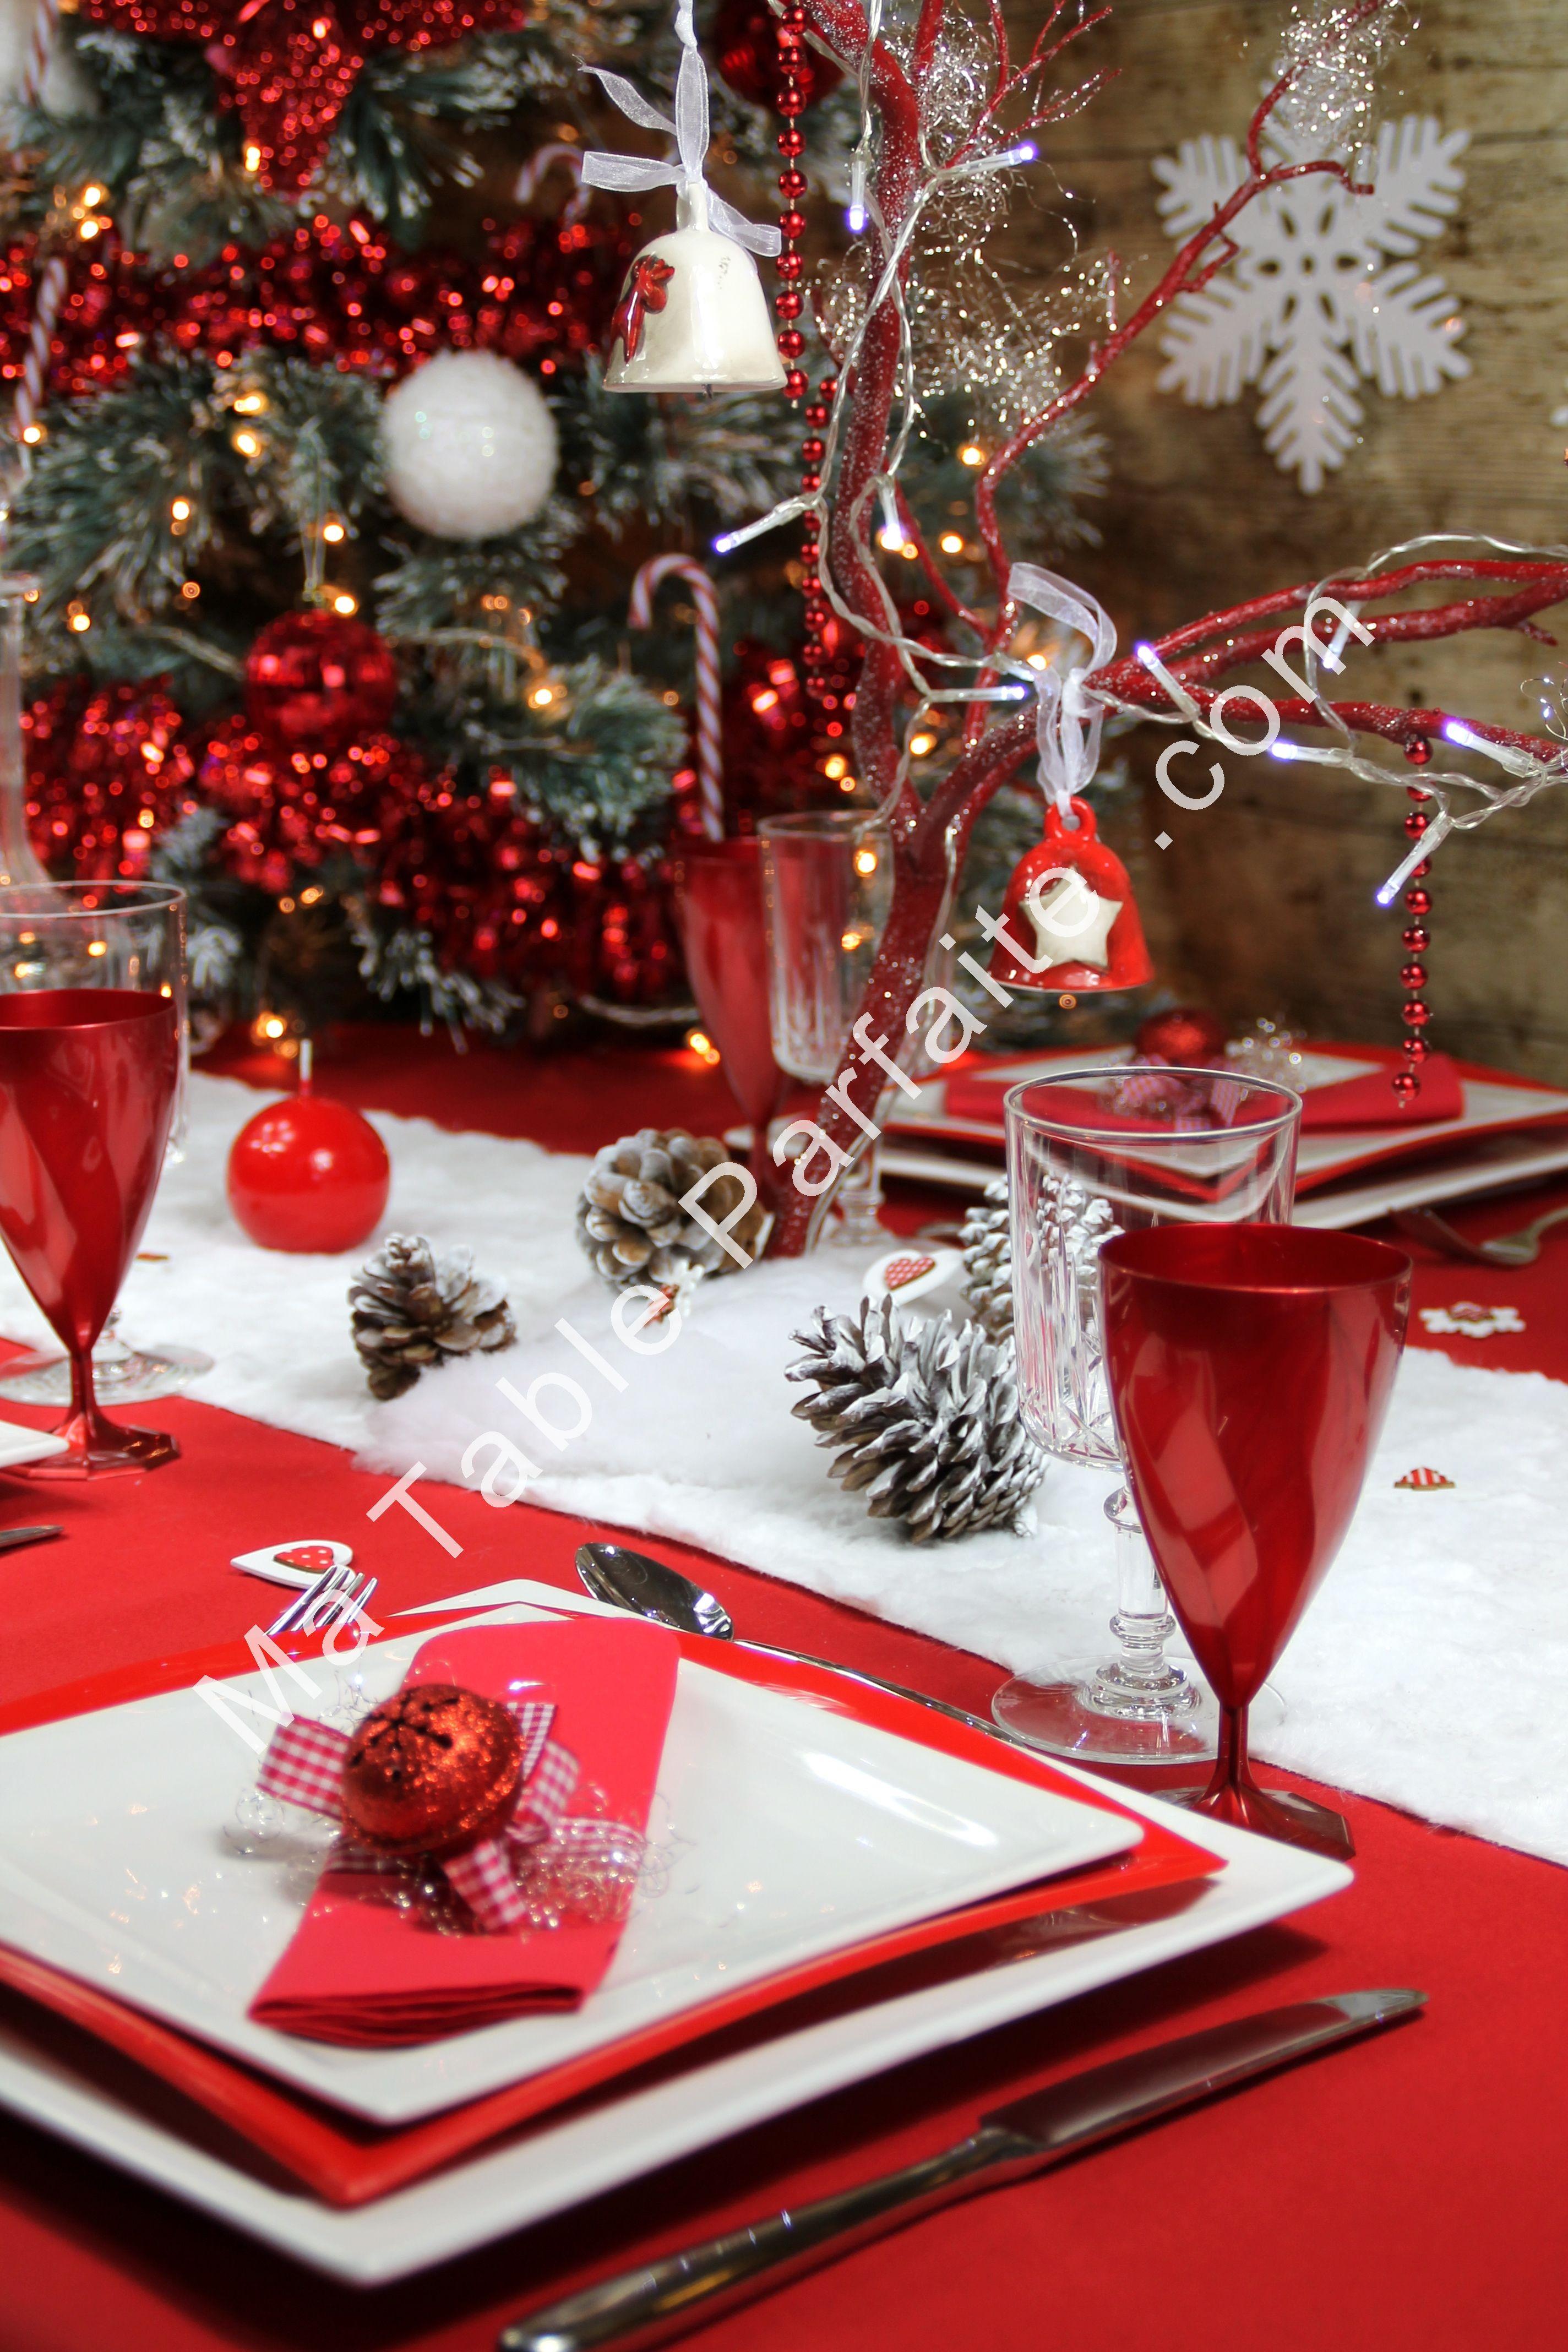 Épinglé par Misa Williams sur I love CHRISTMAS everyday